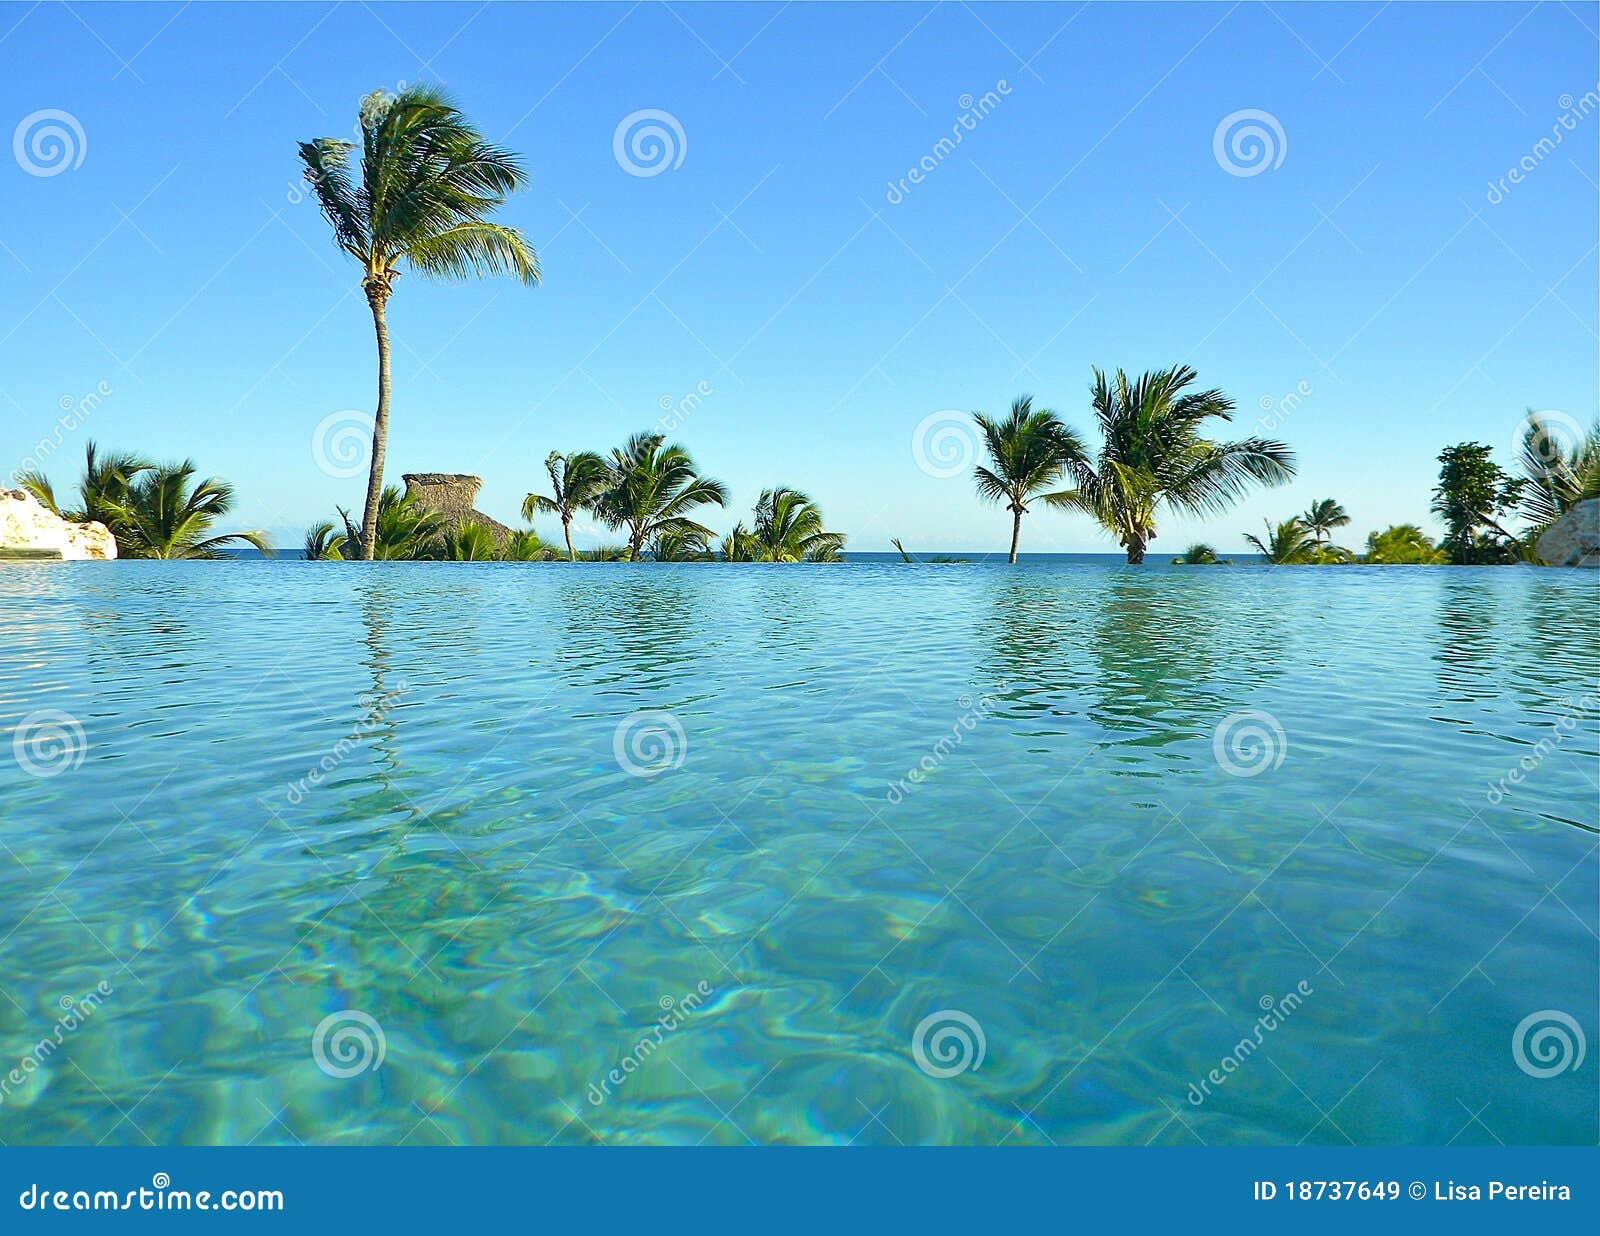 infinity pool punta cana resort stock image image of. Black Bedroom Furniture Sets. Home Design Ideas